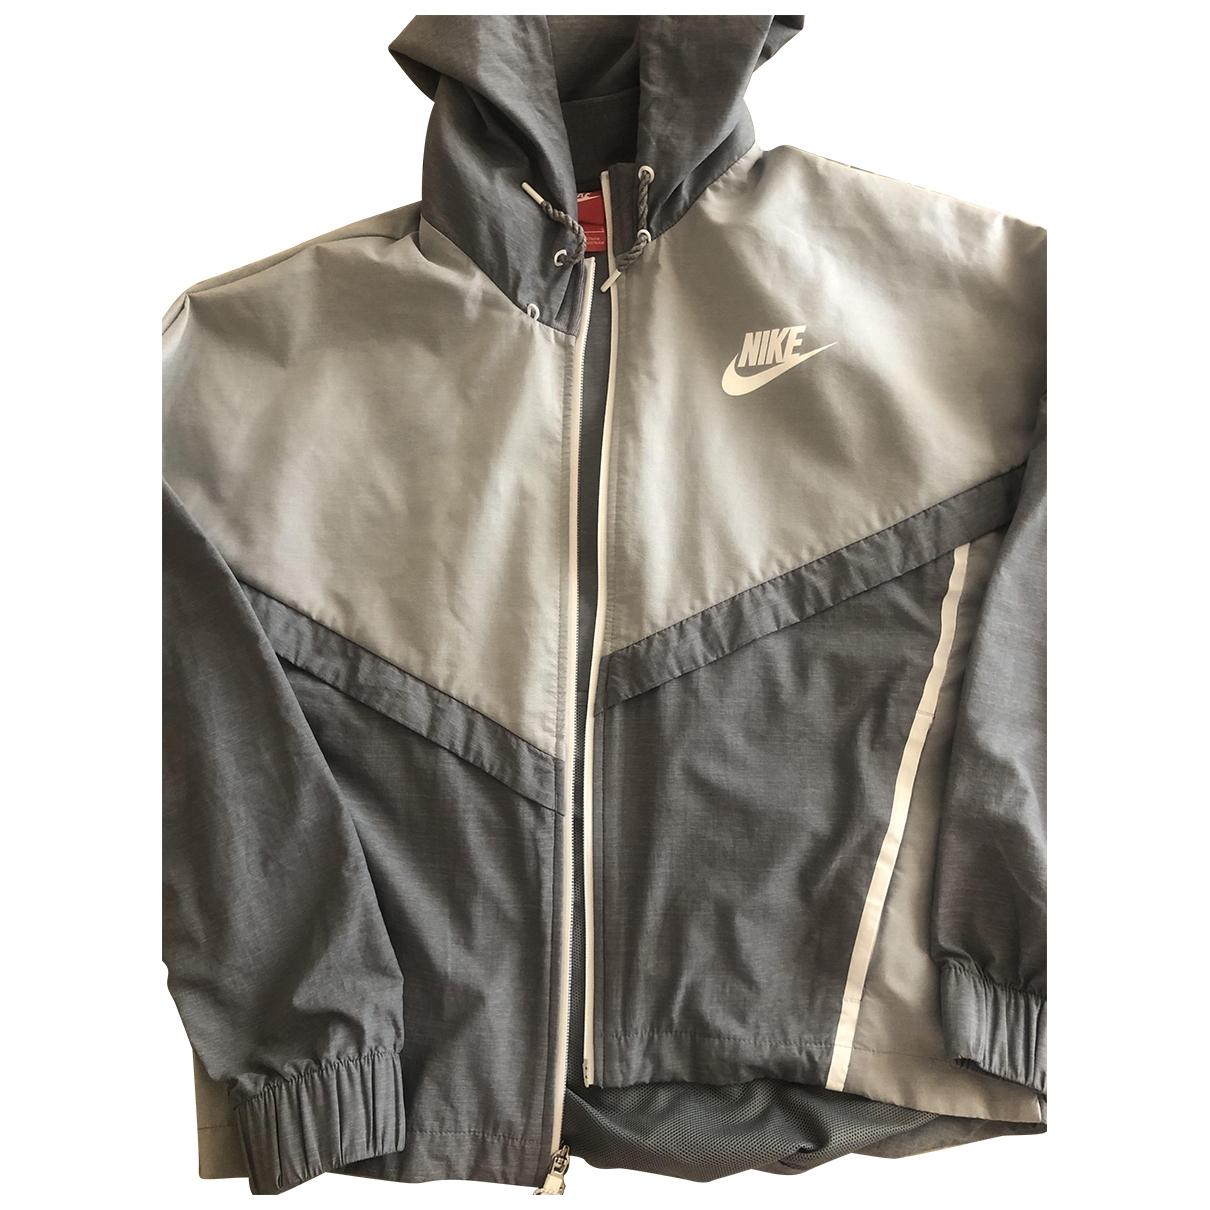 Nike \N Grey jacket for Women L International